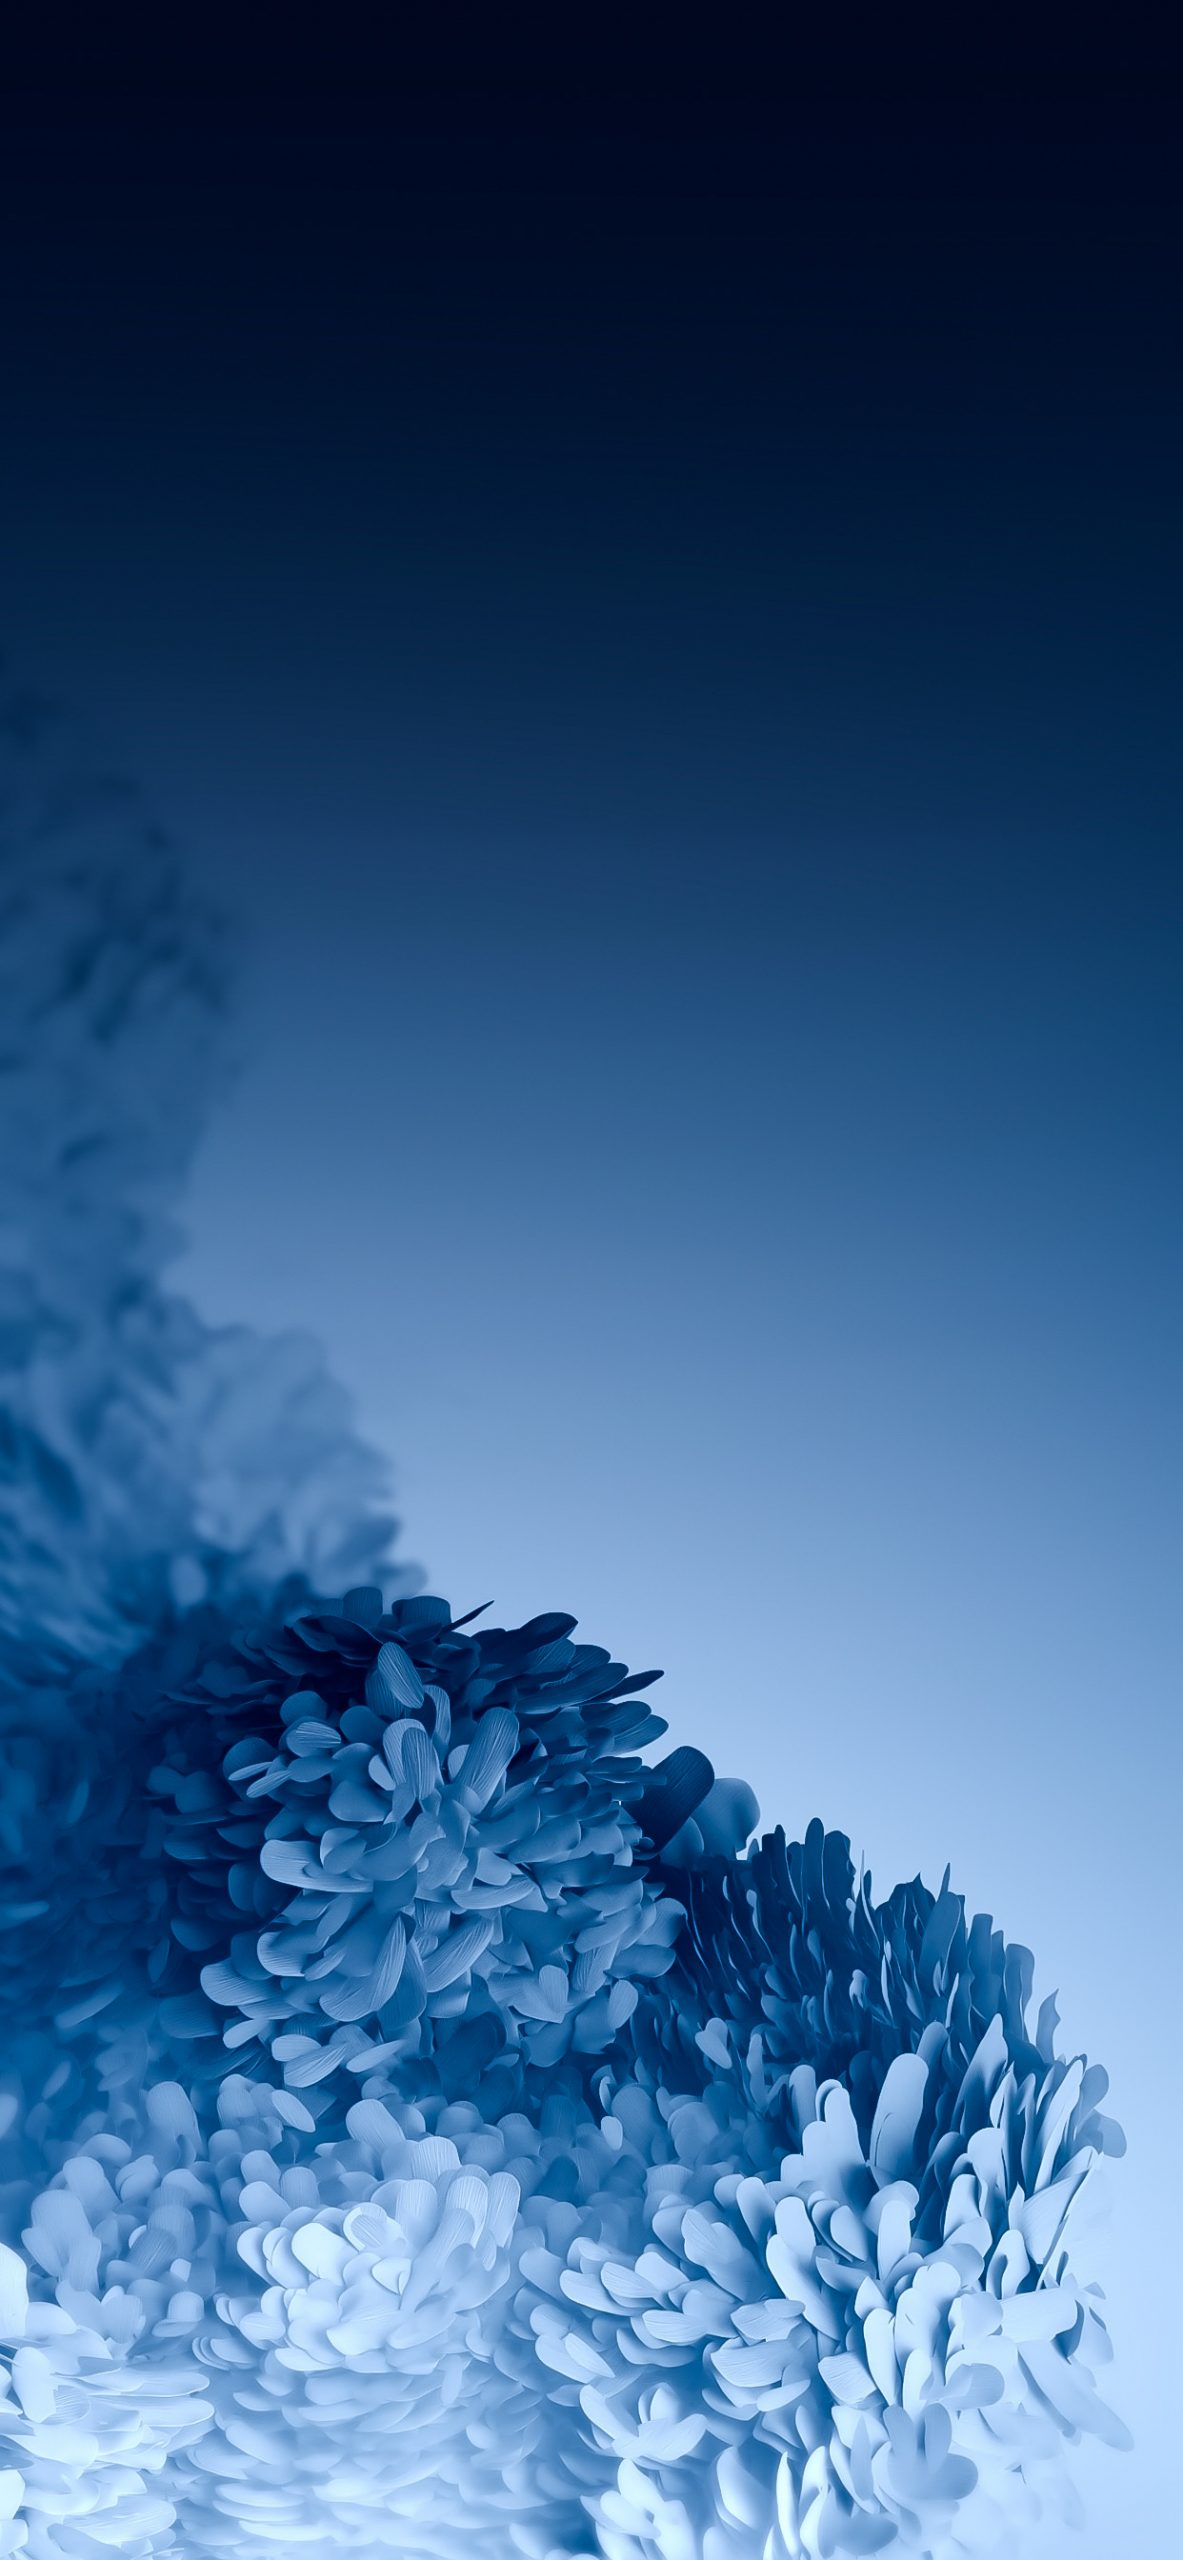 Samsung Galaxy S20 wallpaper iPhone mods 1183x2560